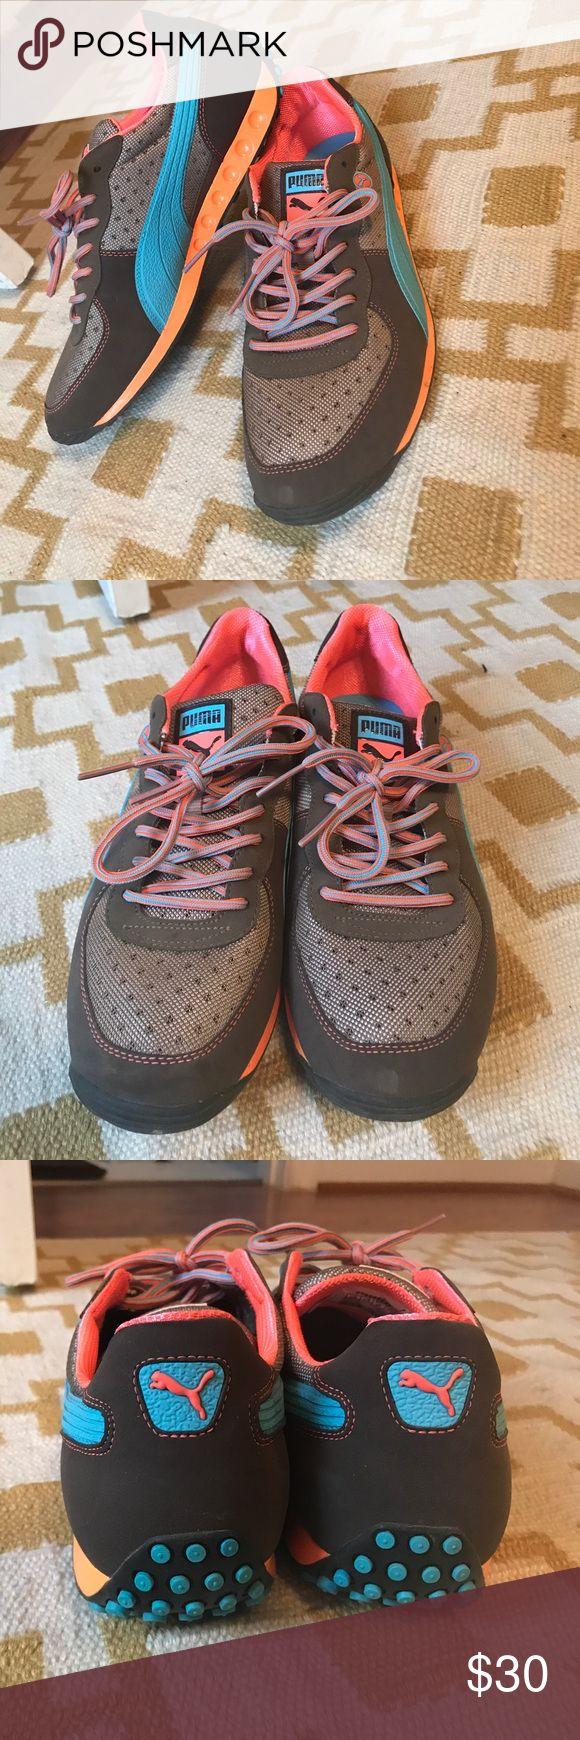 Brown, blue orange, men's Puma trainers SZ 10.5 Almost new men's Puma trainer only worn twice. Brown, orange and blue. Great as a street shoe or fashion statement. US size 10.5, EU 44 Puma Shoes Athletic Shoes